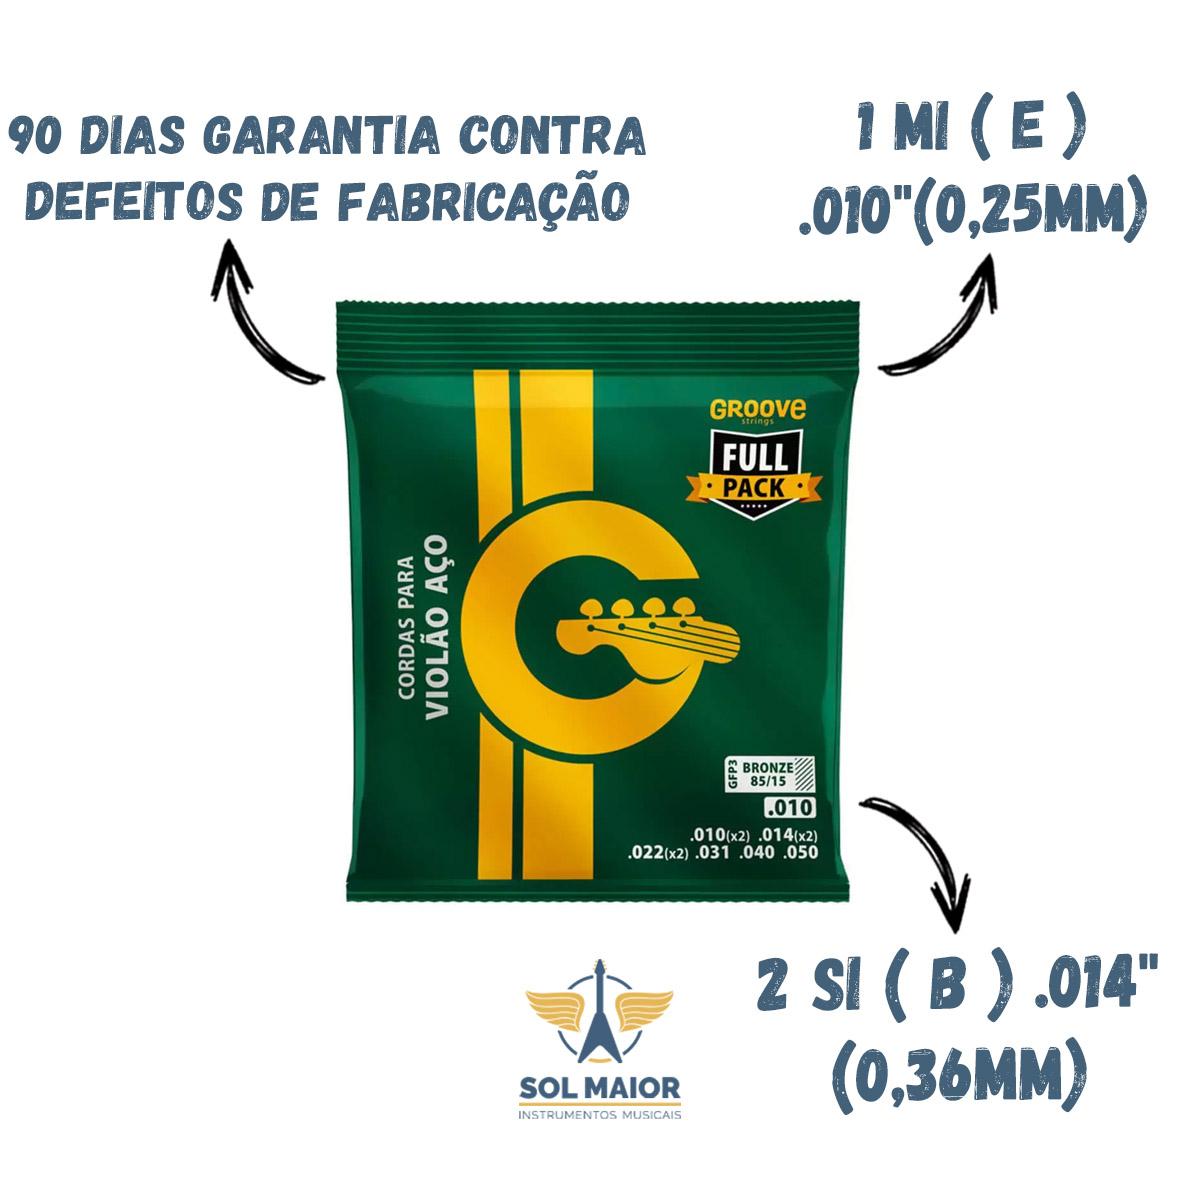 Kit 5 Cordas Groove Violão Aço Full Pack .010 Gfp3 - Solez